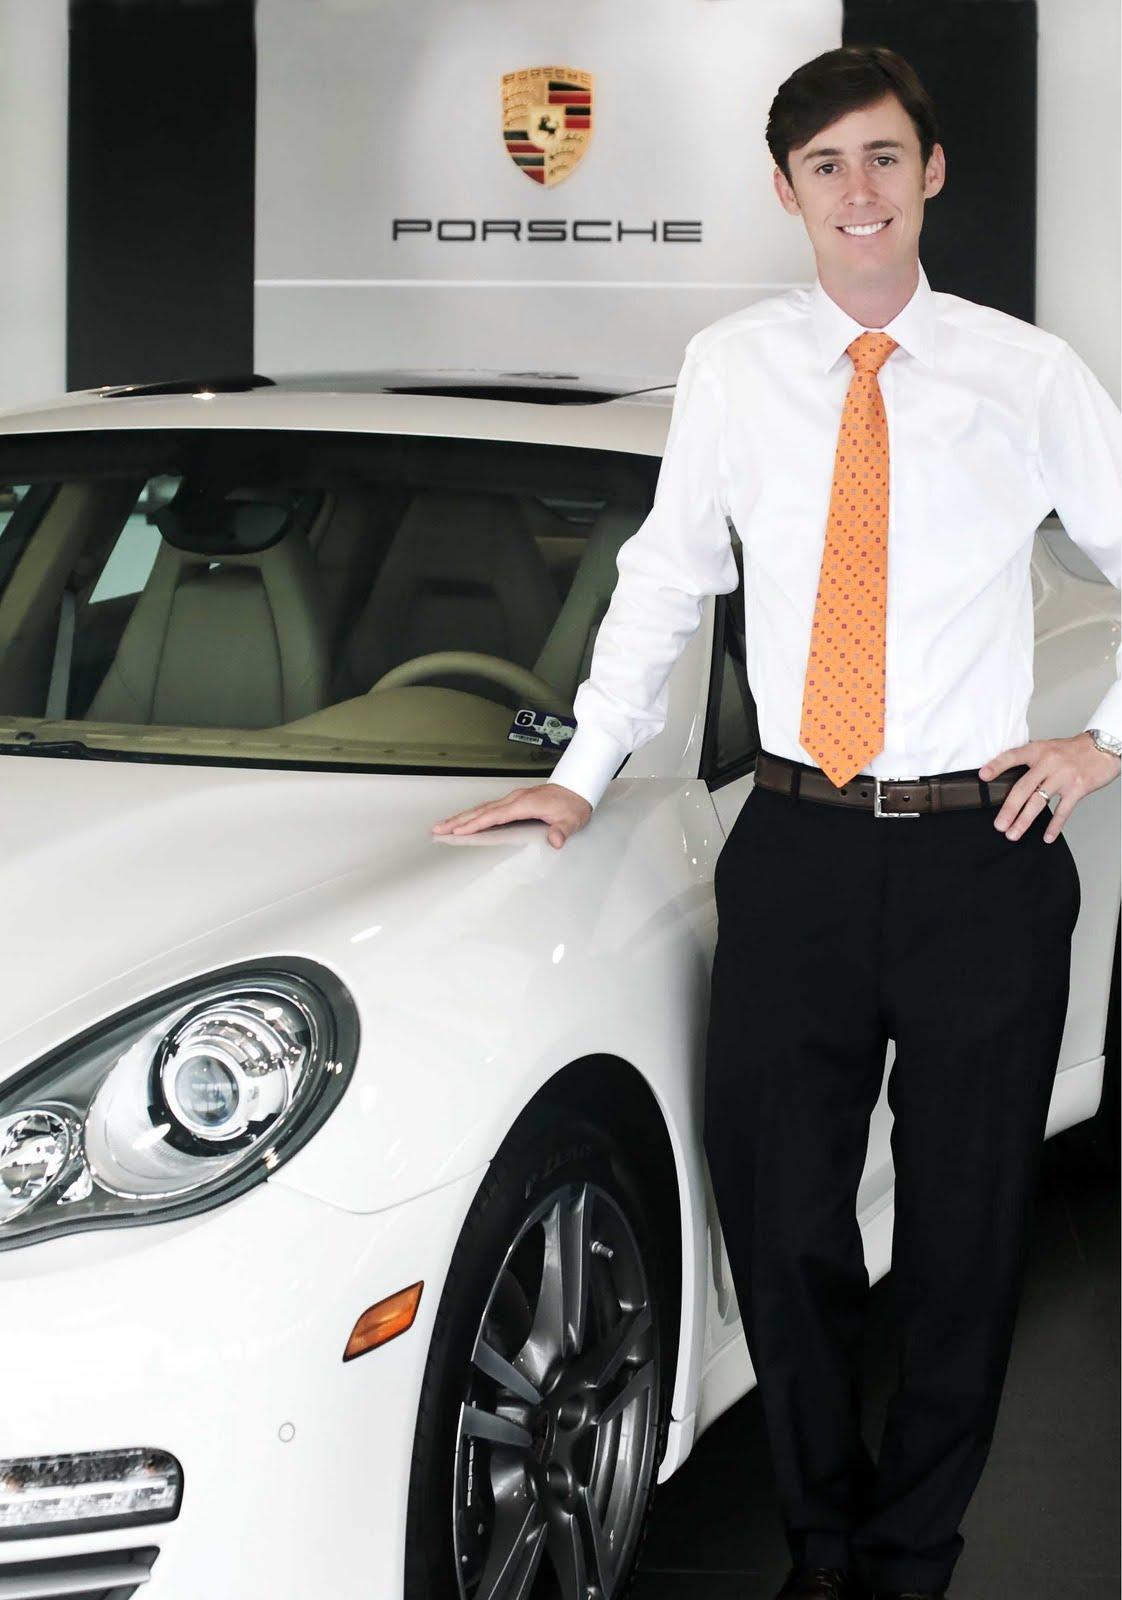 Porsche Of North Houston Porsche Of North Houston